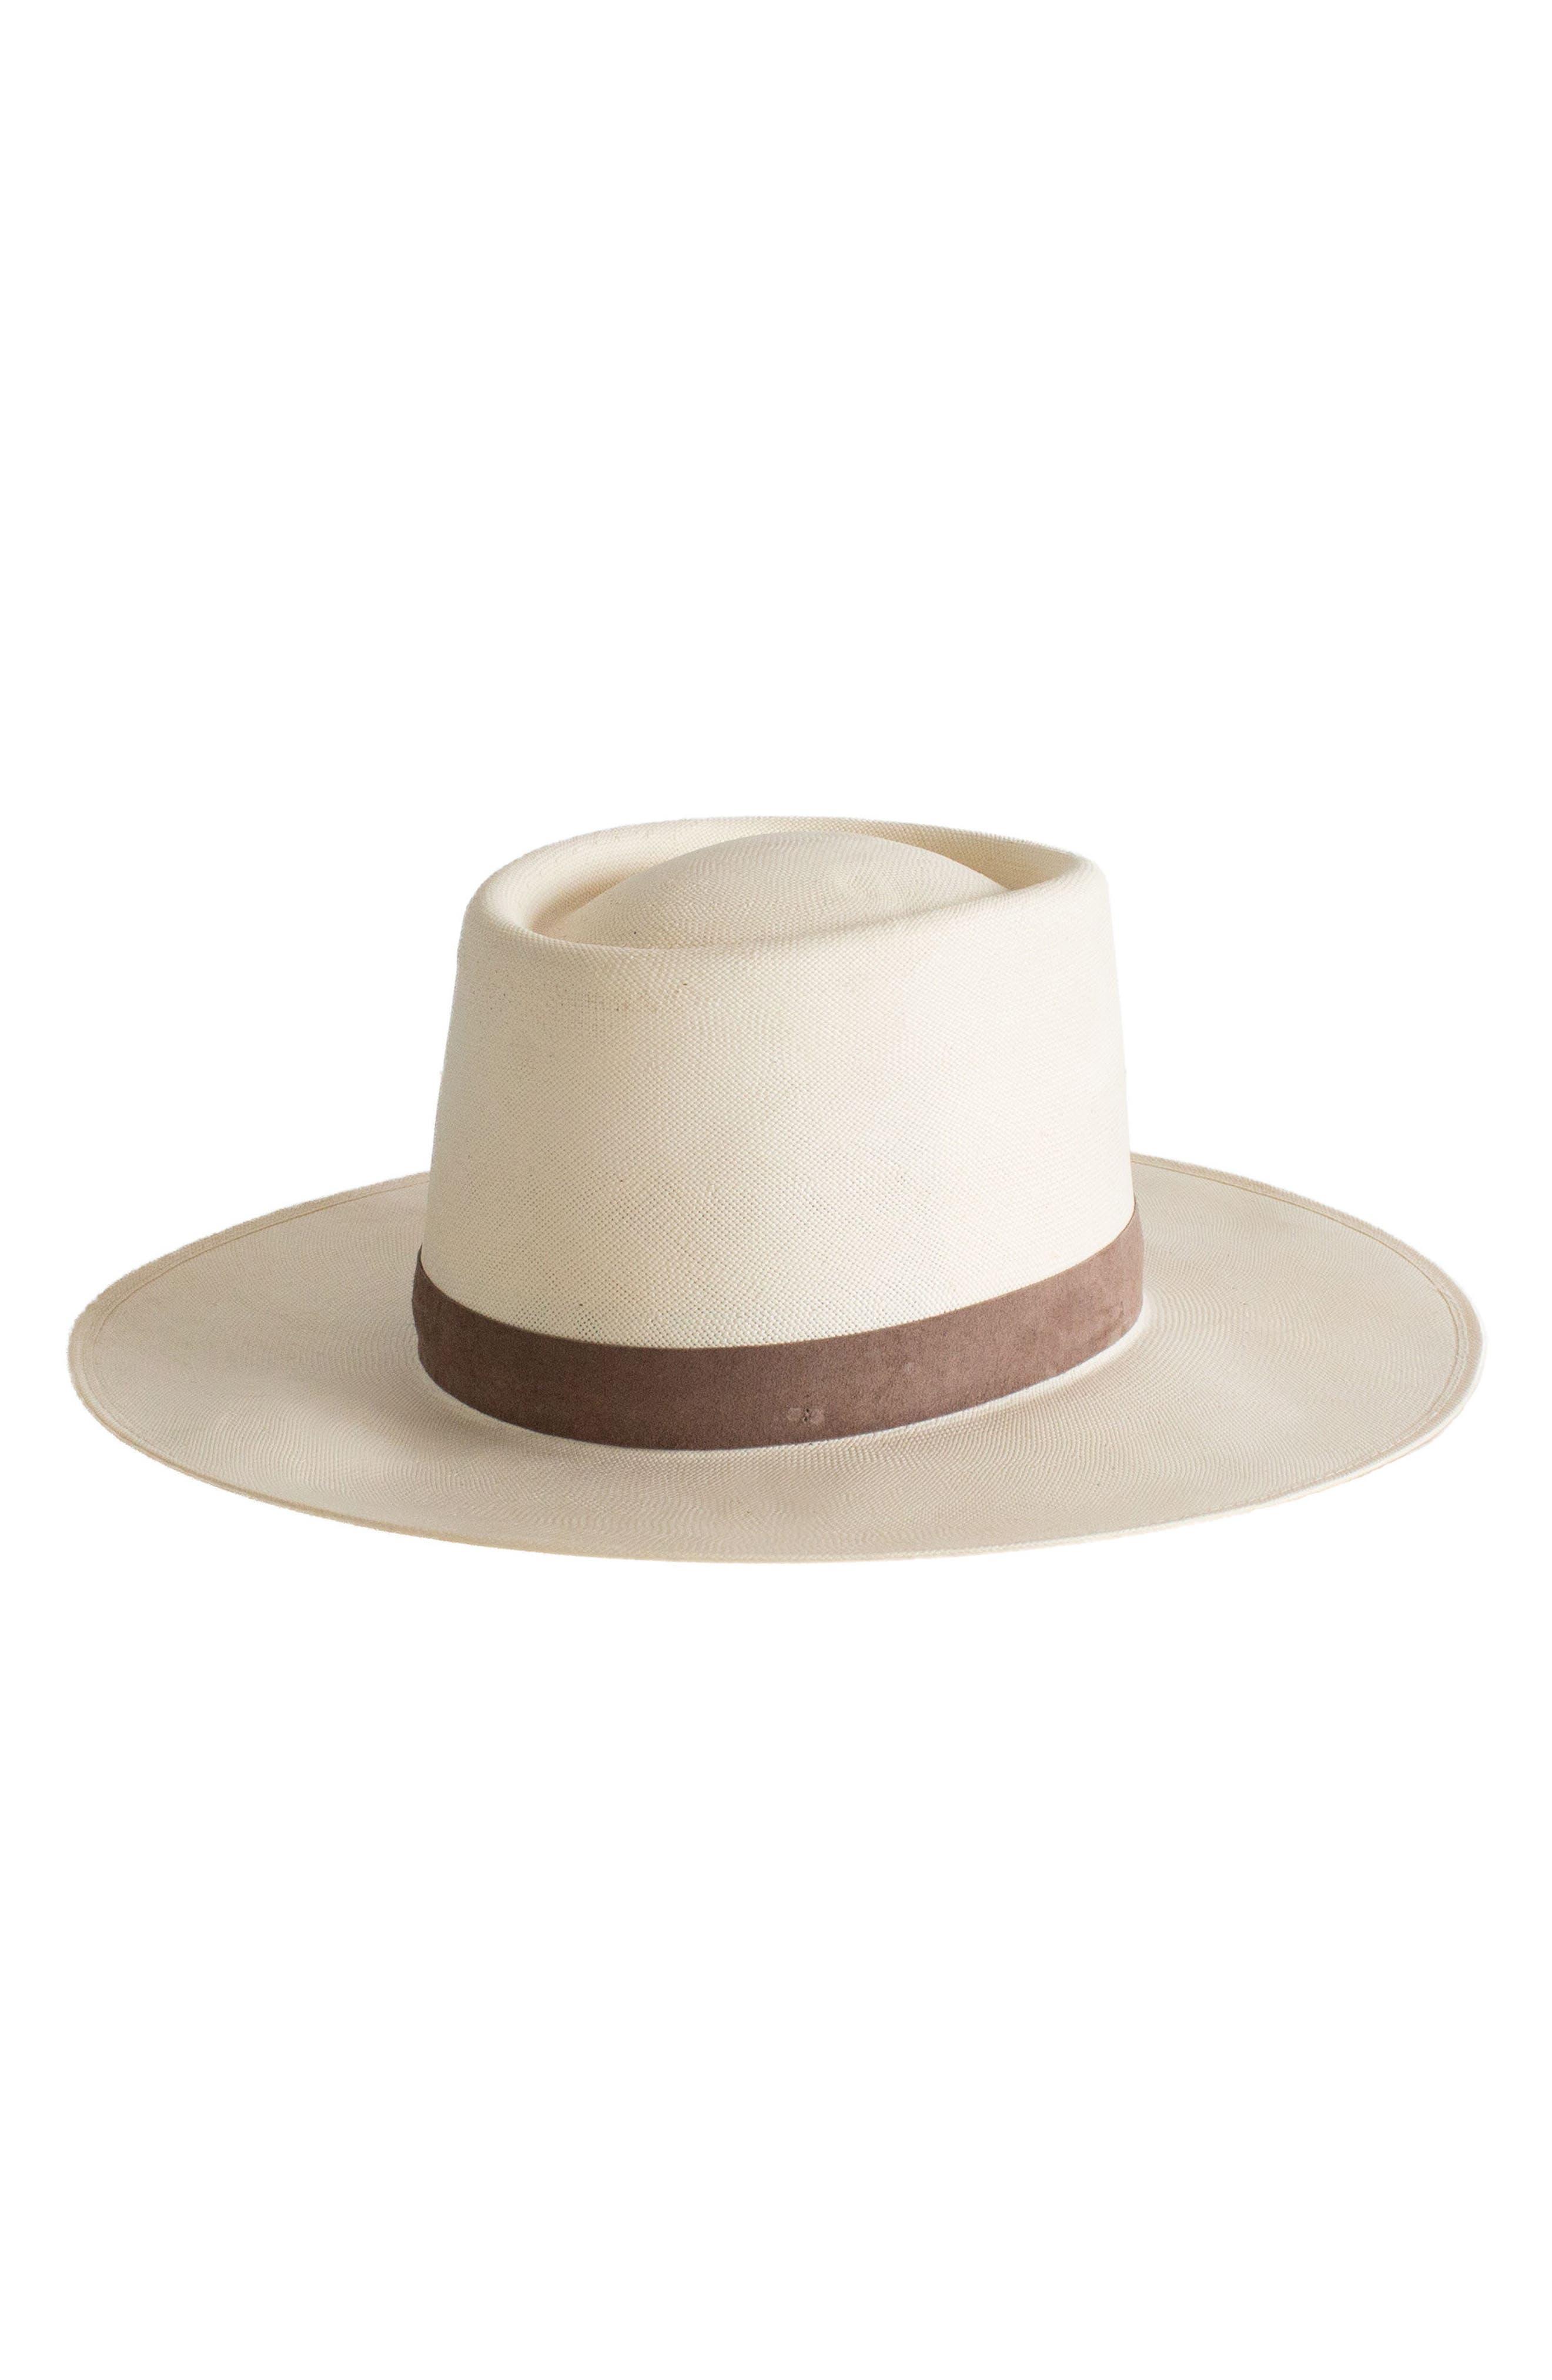 Shea Straw Hat,                             Main thumbnail 1, color,                             Ivory